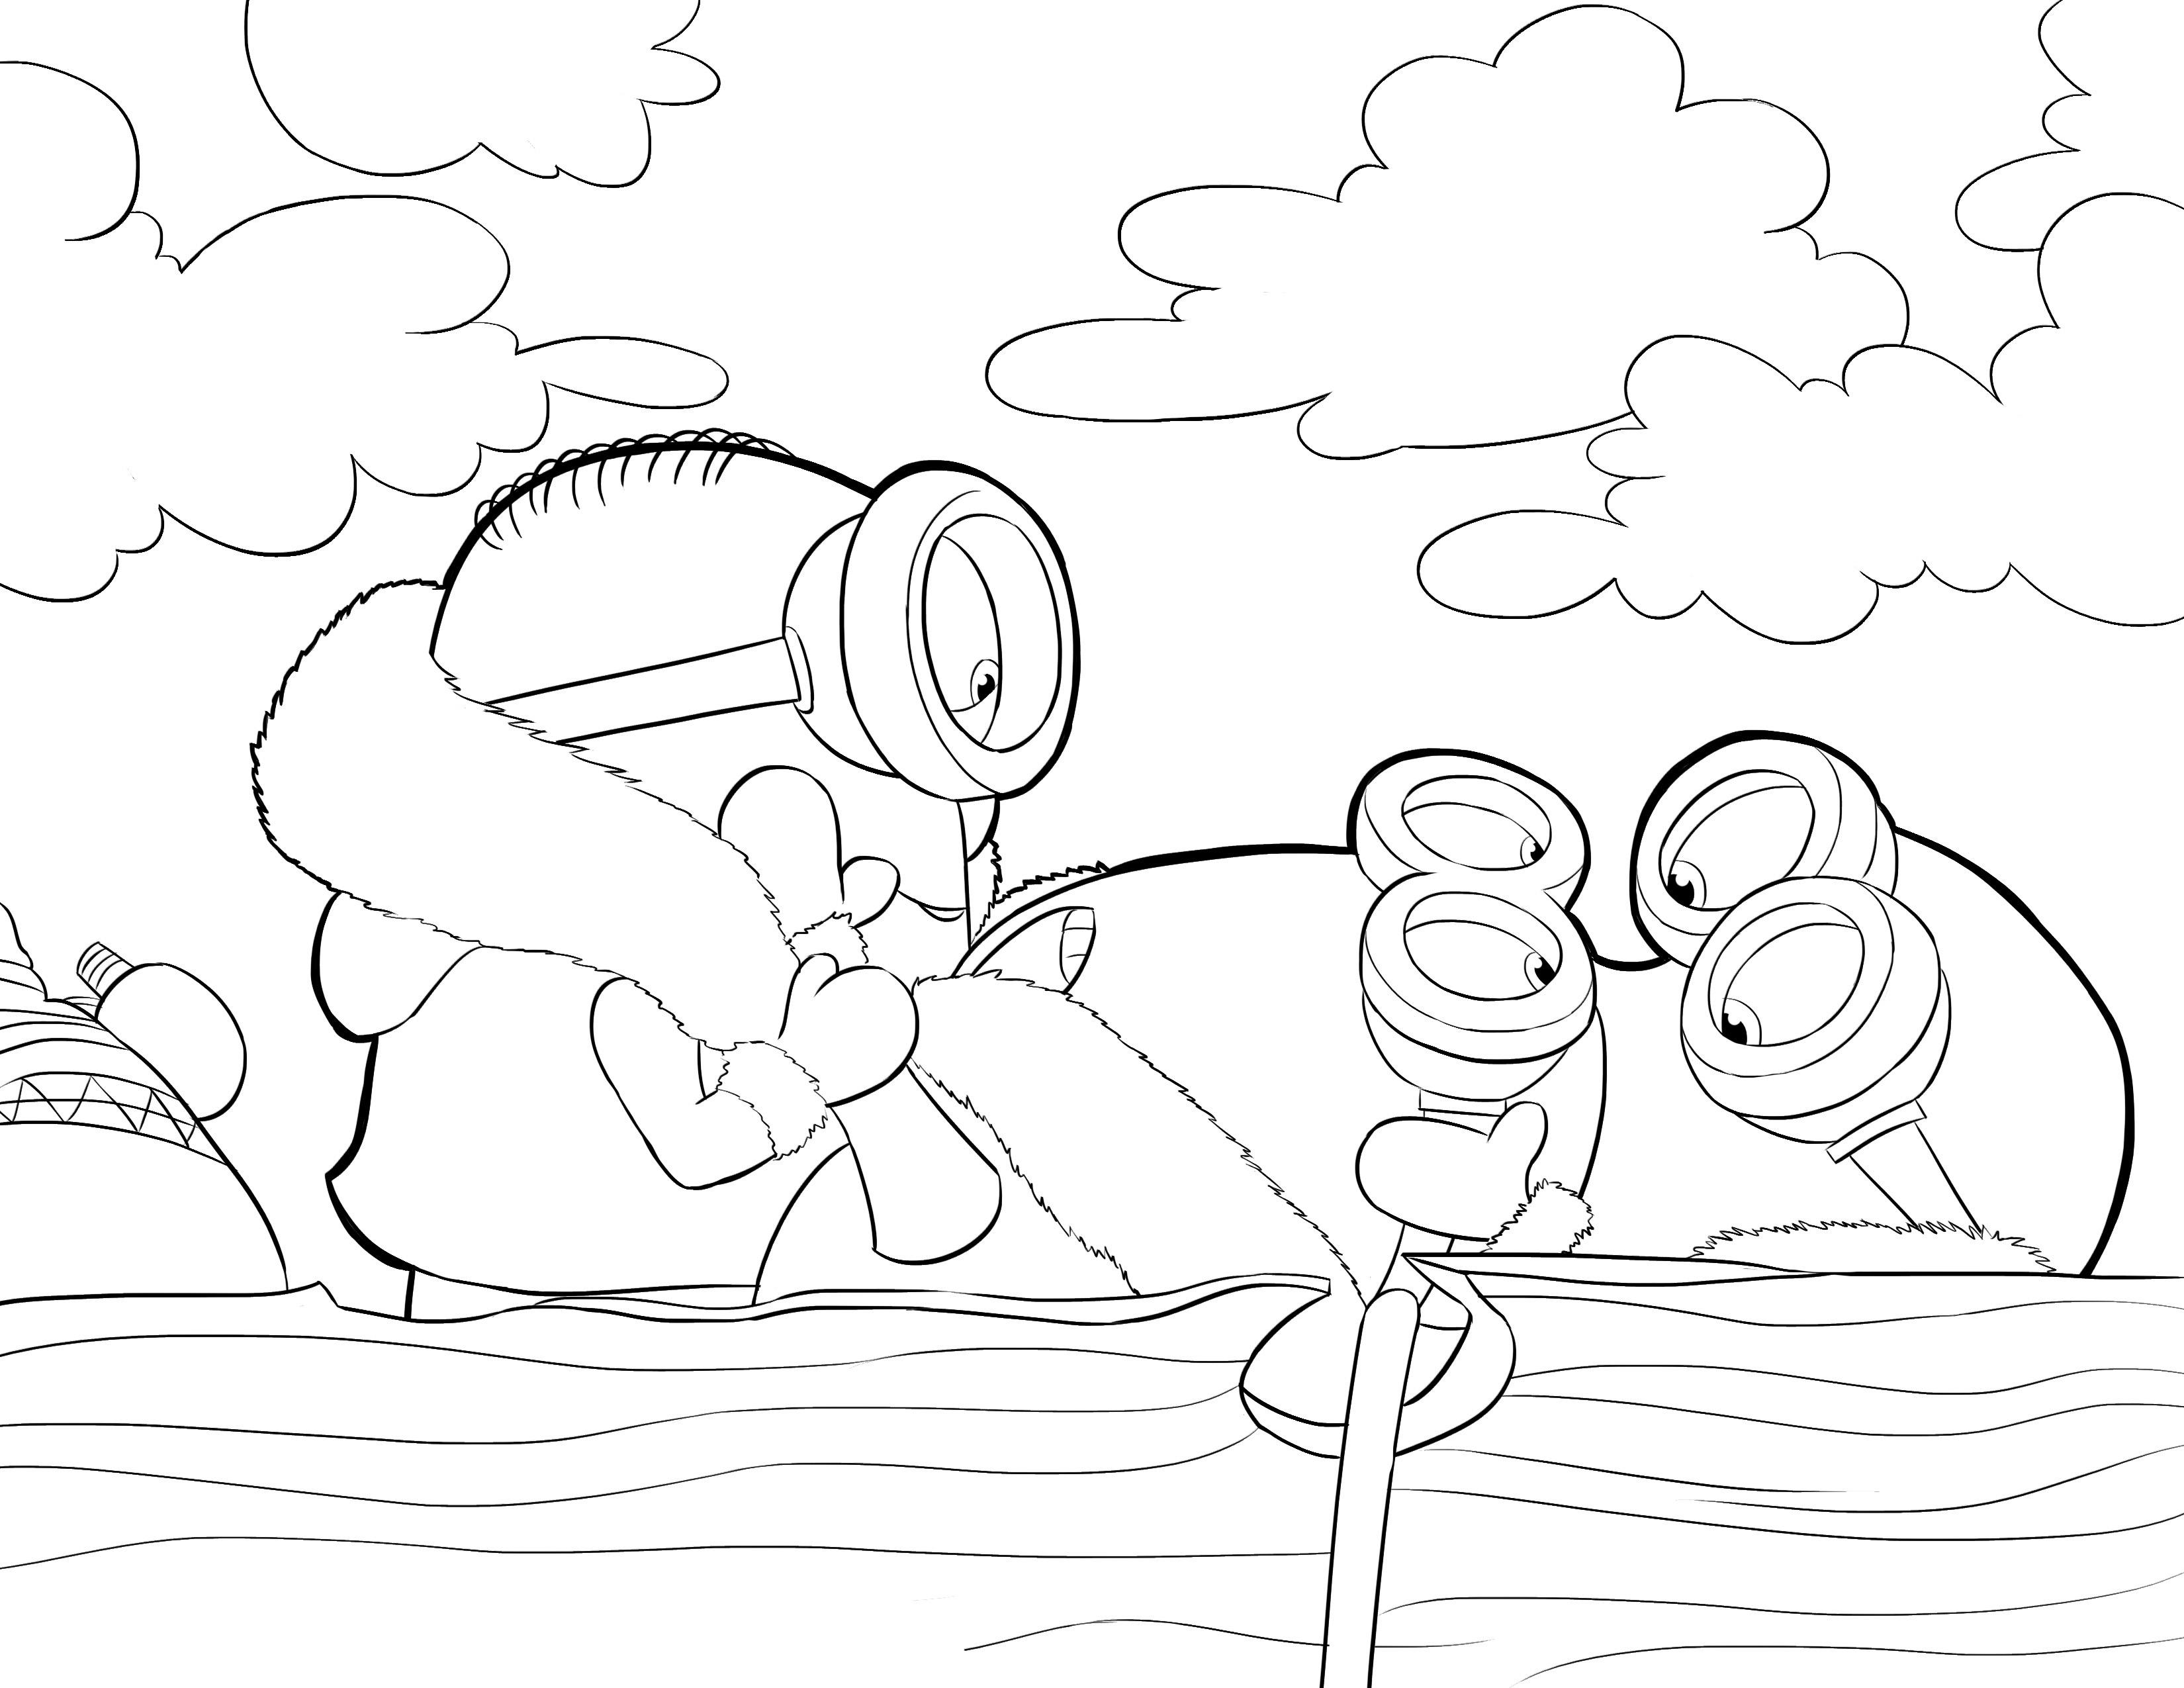 Desenho De Minions No Barco Para Colorir